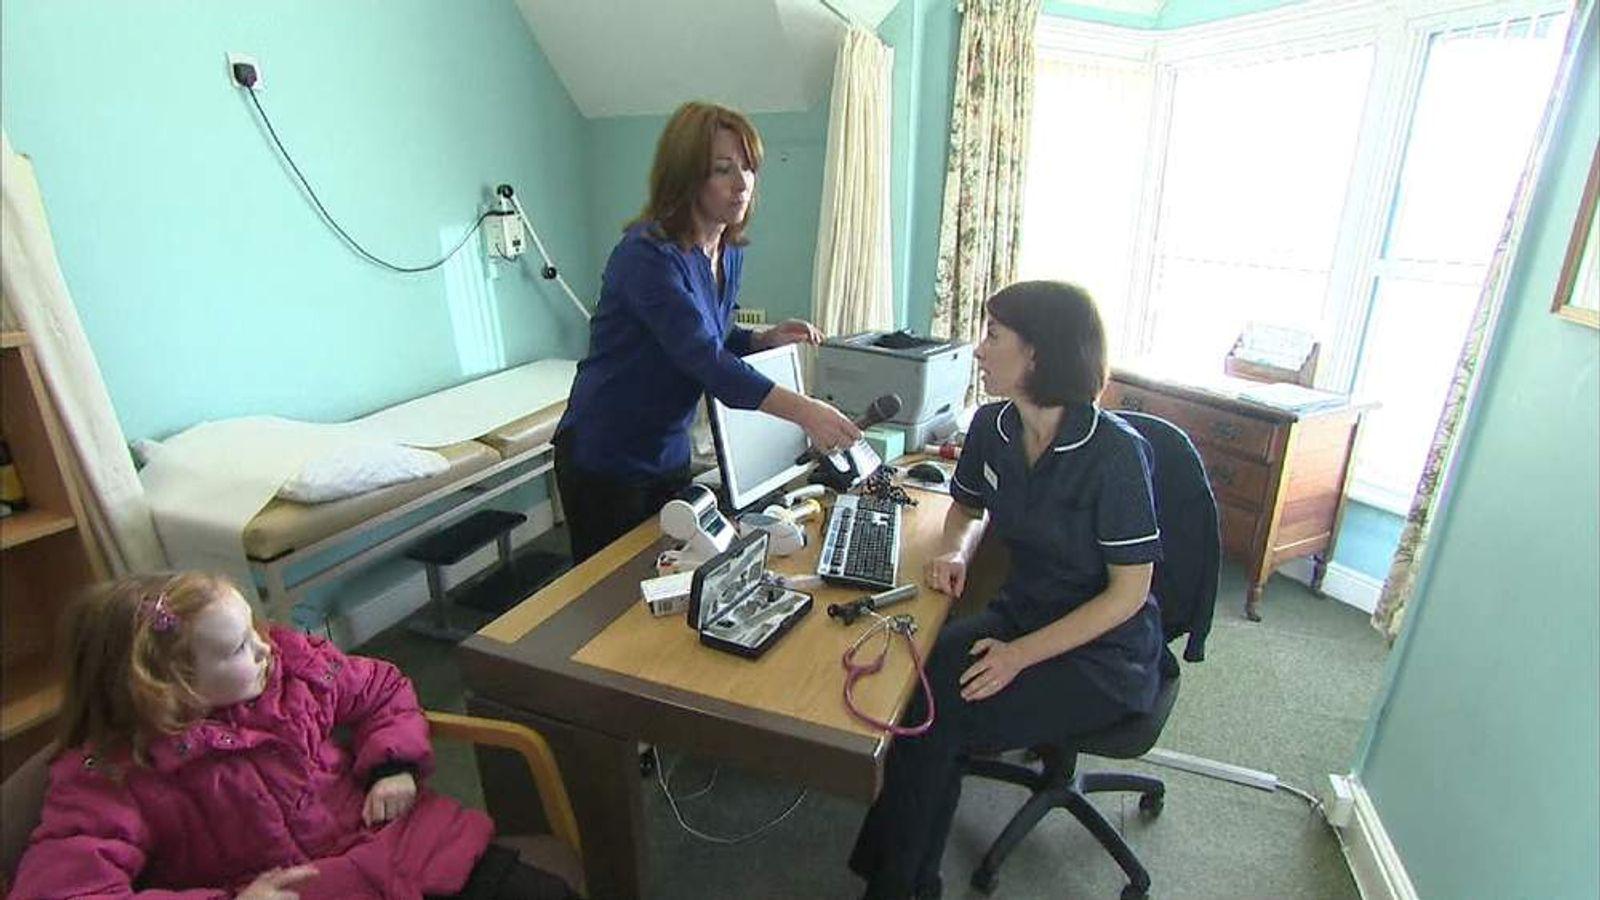 Kay Burley interviews a nurse at a GP surgery